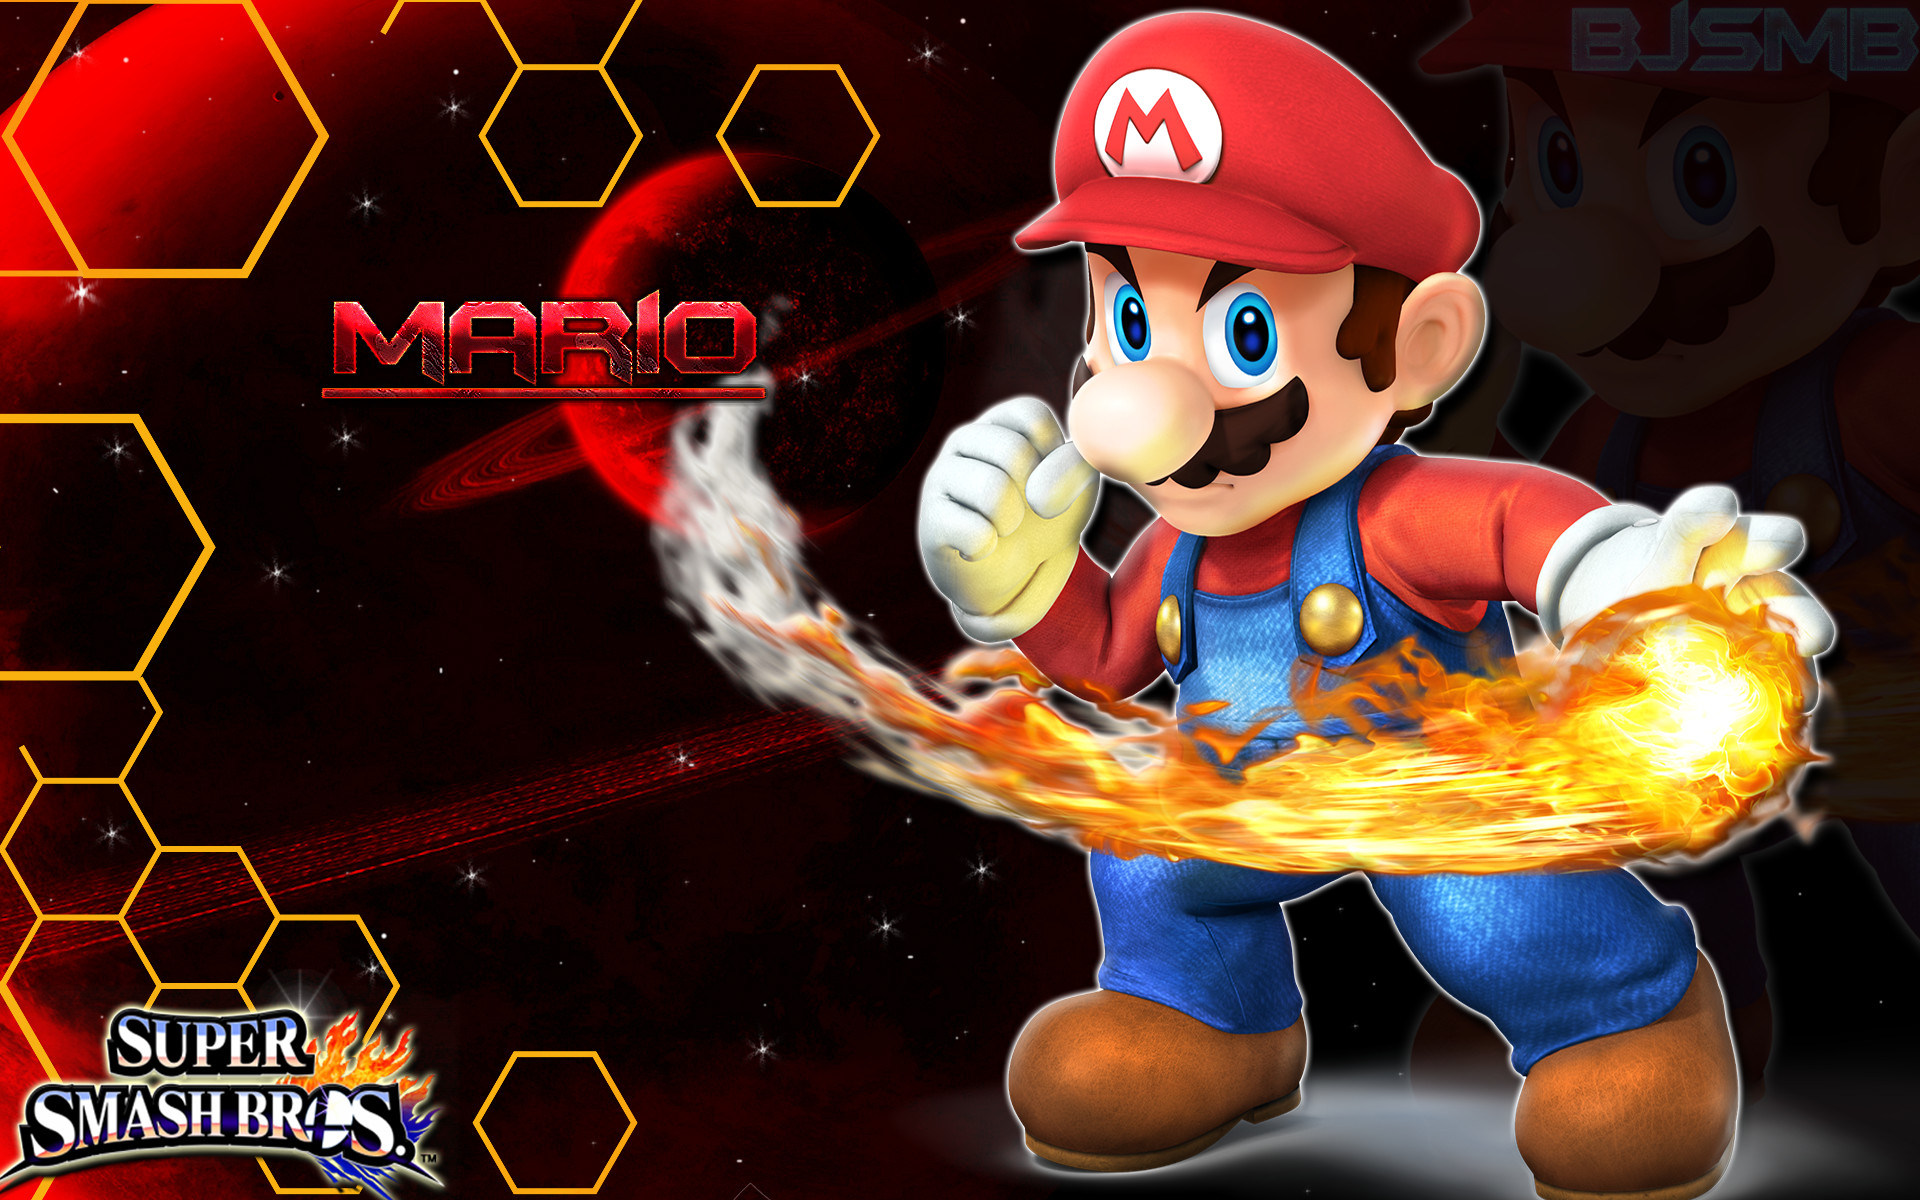 4 Wallpaper/Background by BowserJrSMB Mario – Super Smash Bros. 4 Wallpaper/Background  by BowserJrSMB